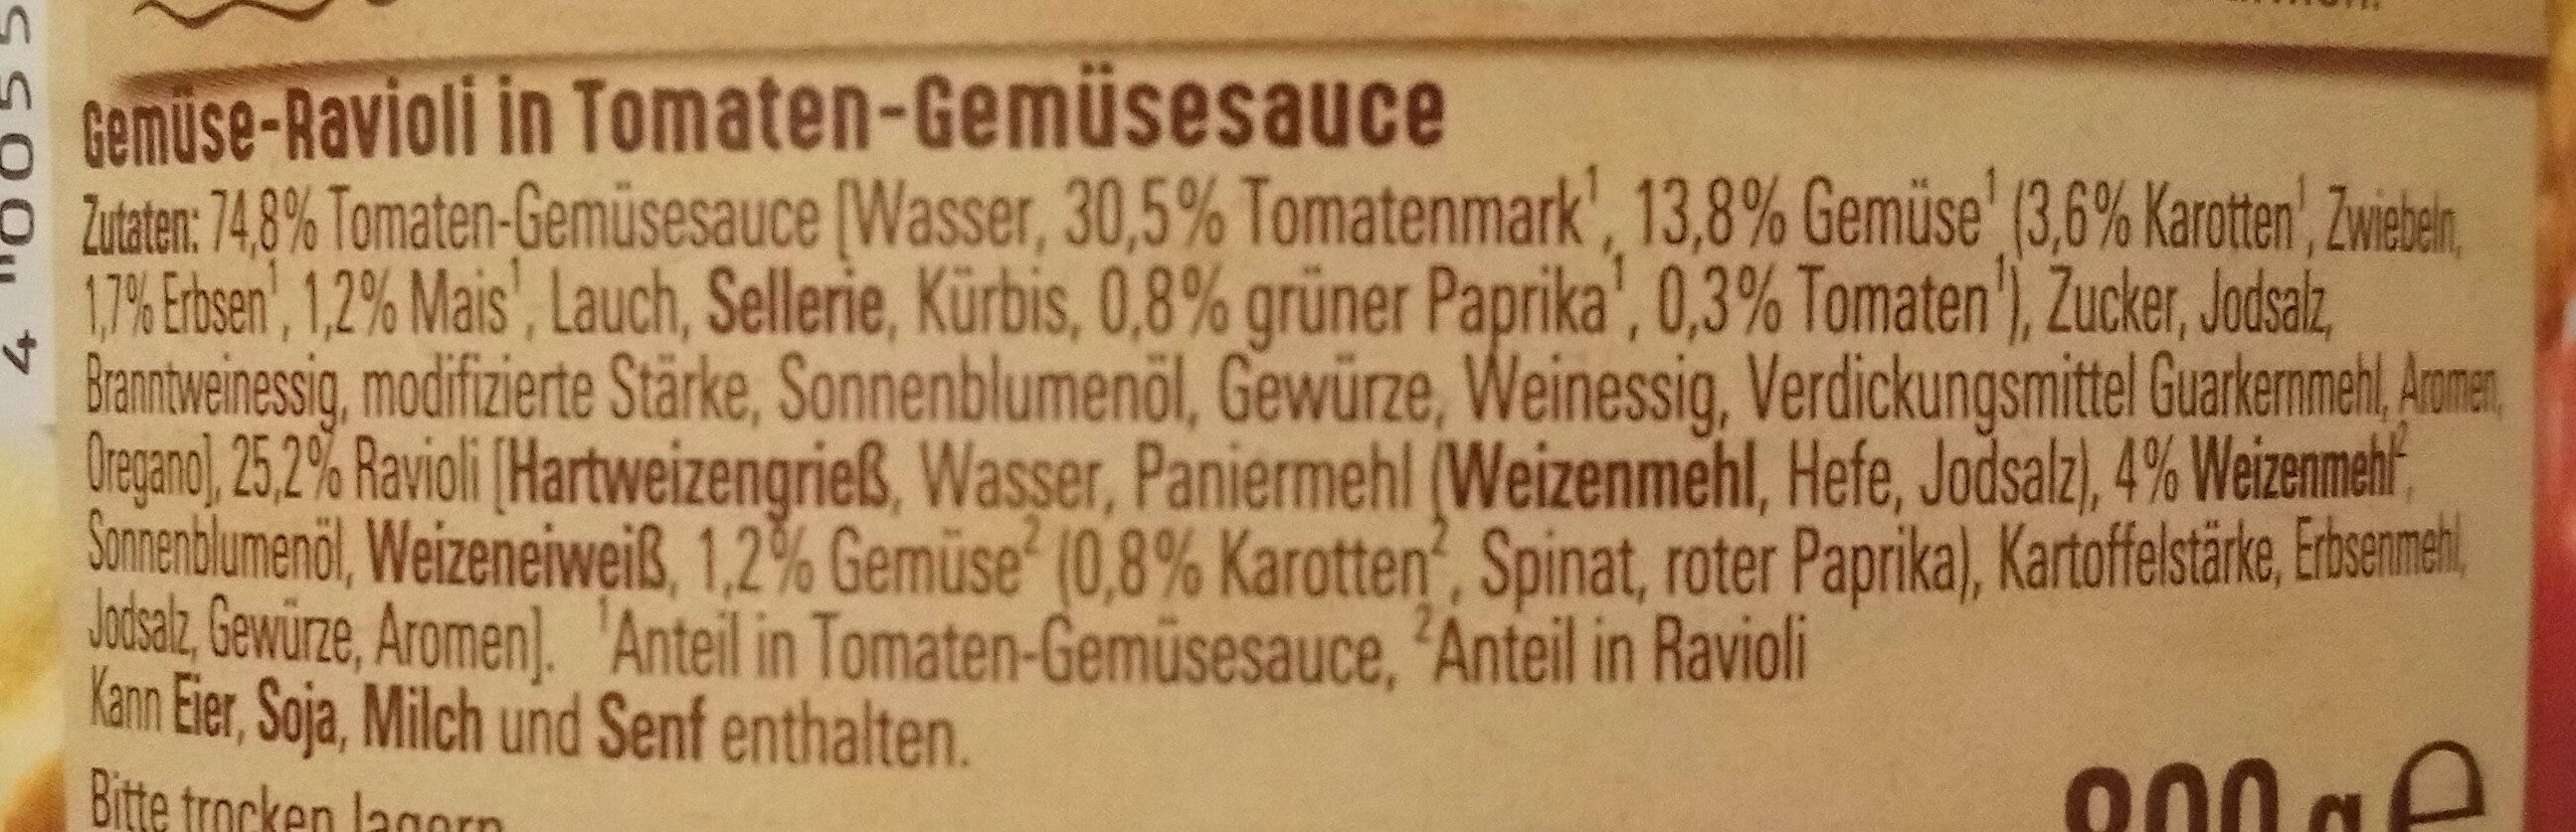 Ravioli Gemüse - Inhaltsstoffe - de